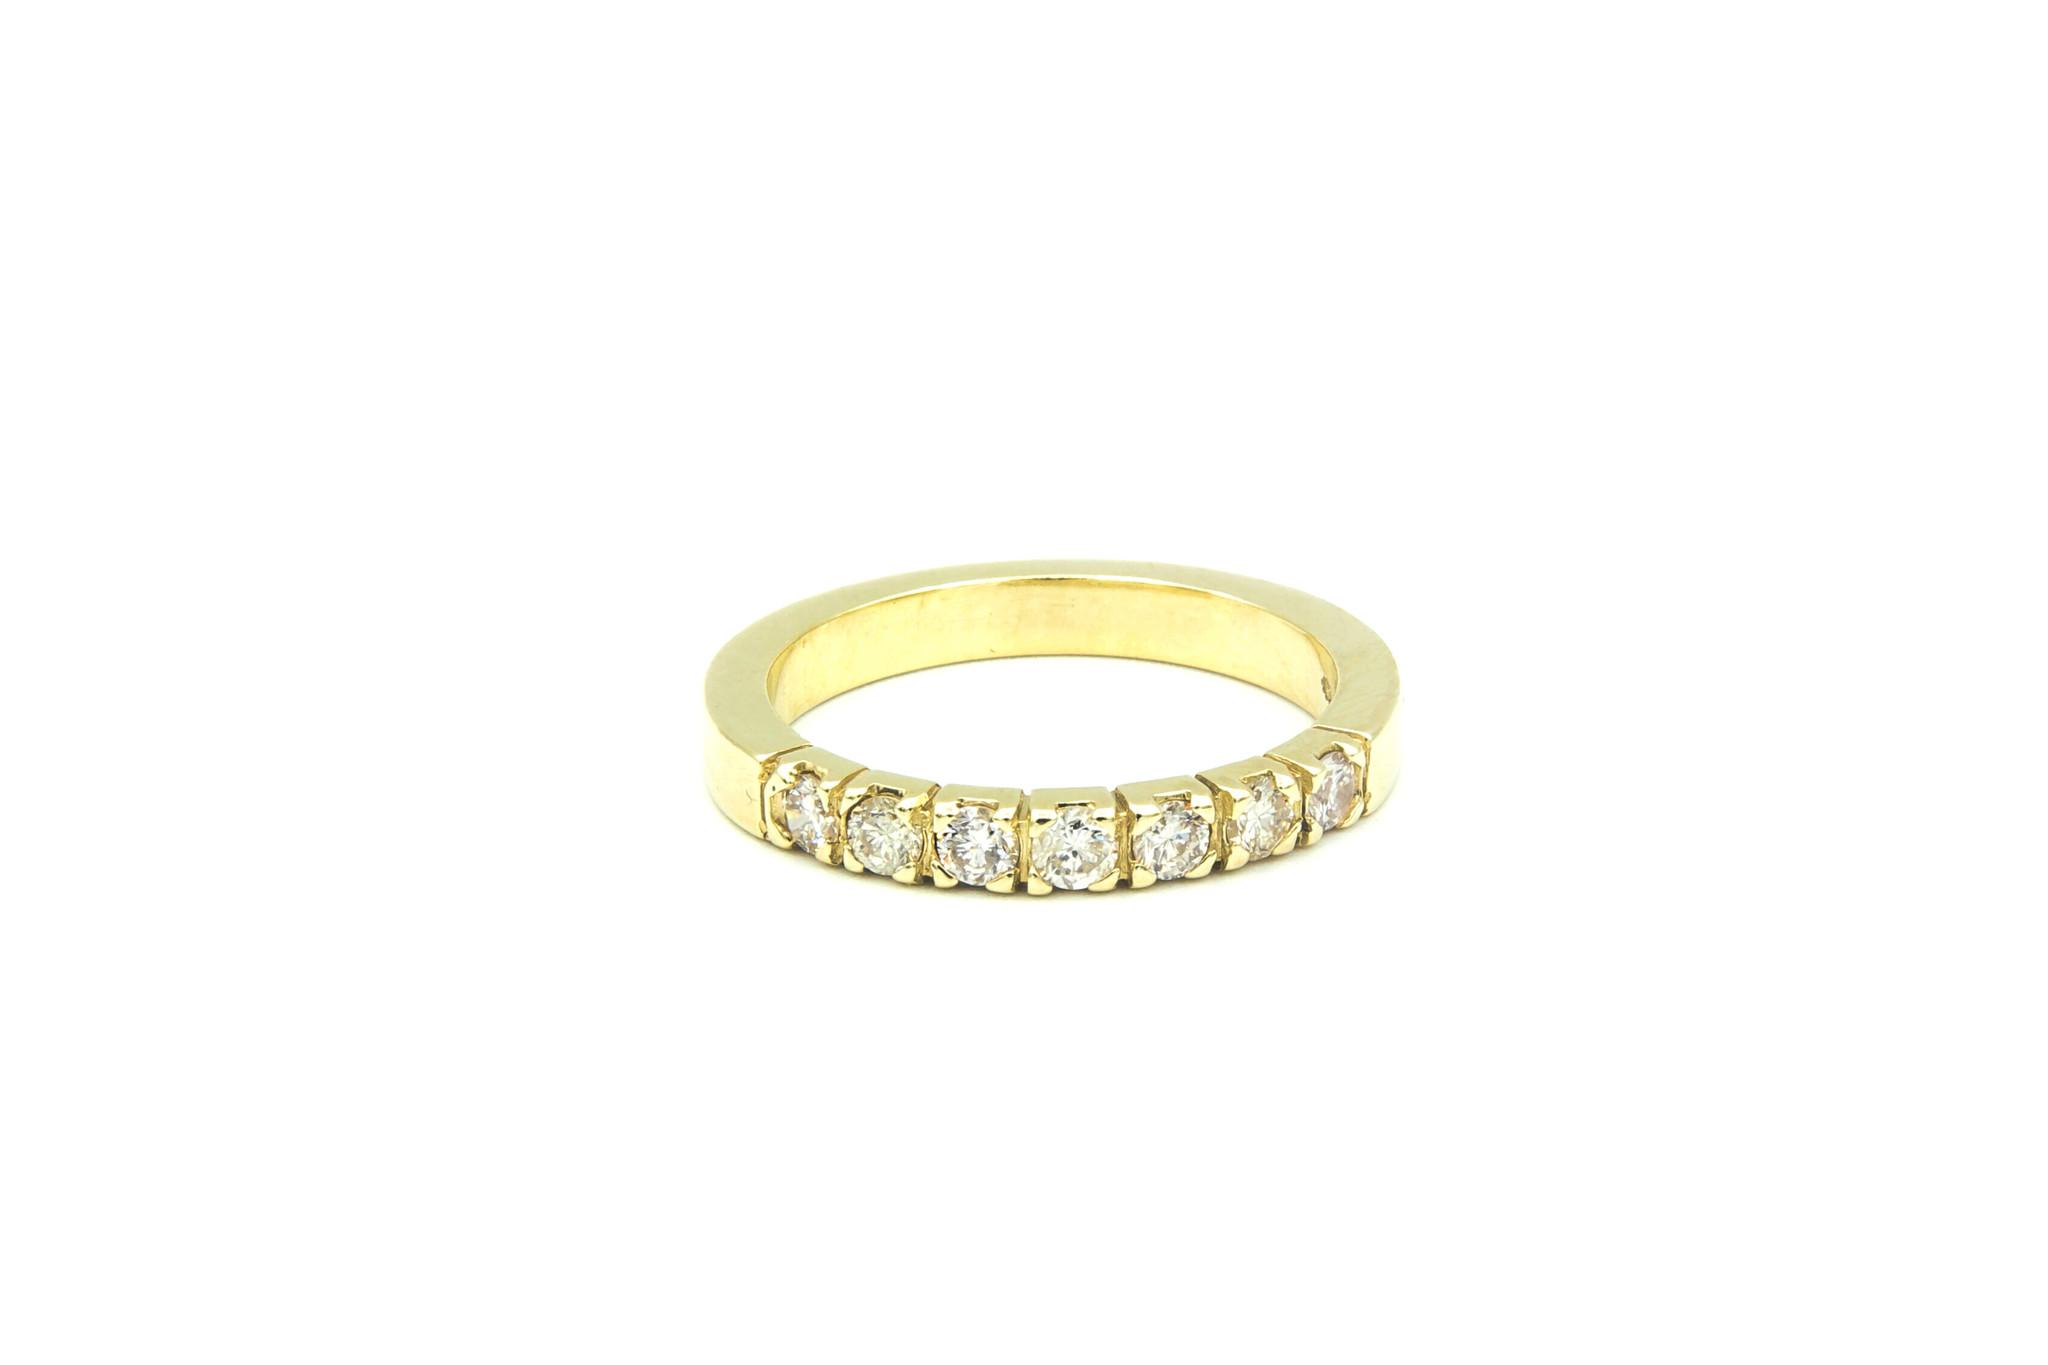 Ring verlovingsring klassiek met 7 diamanten ingezet-1